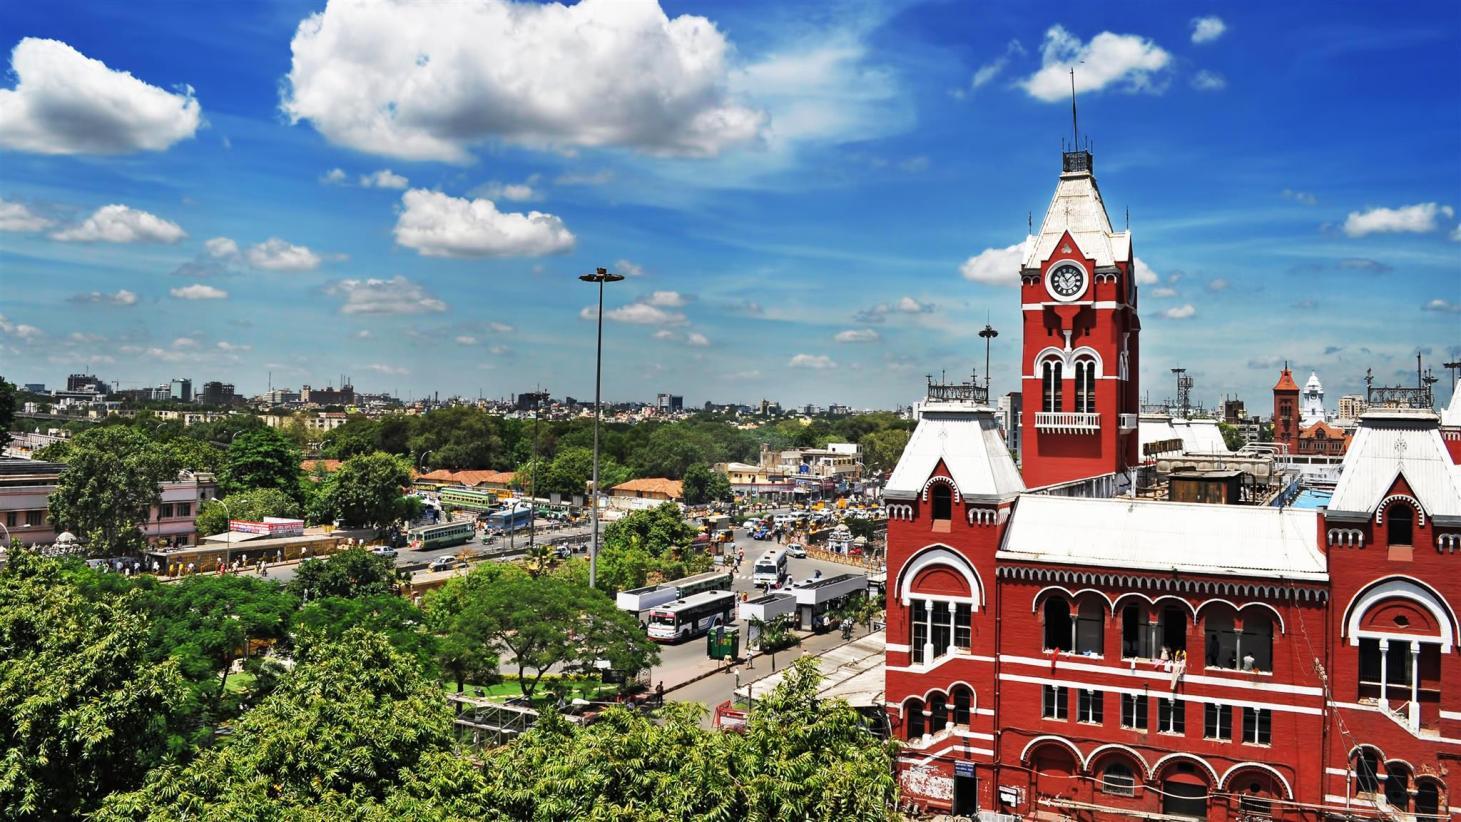 EOT Crane Manufacturer in Chennai